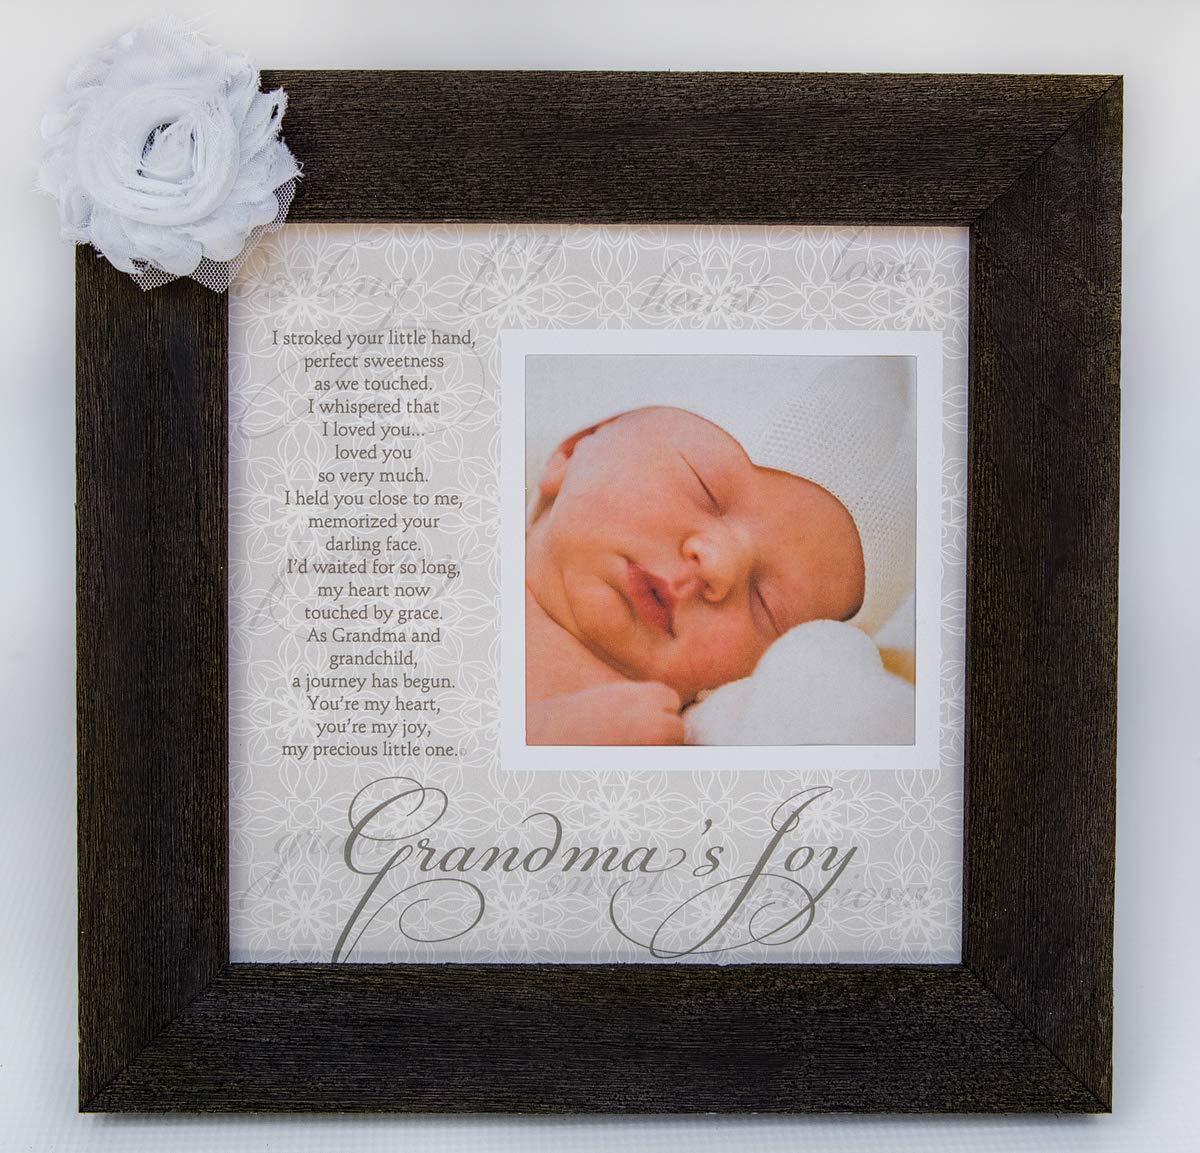 Amazon.com: Grandma\'s Joy Picture Frame with Poetry - Barnwood: Baby